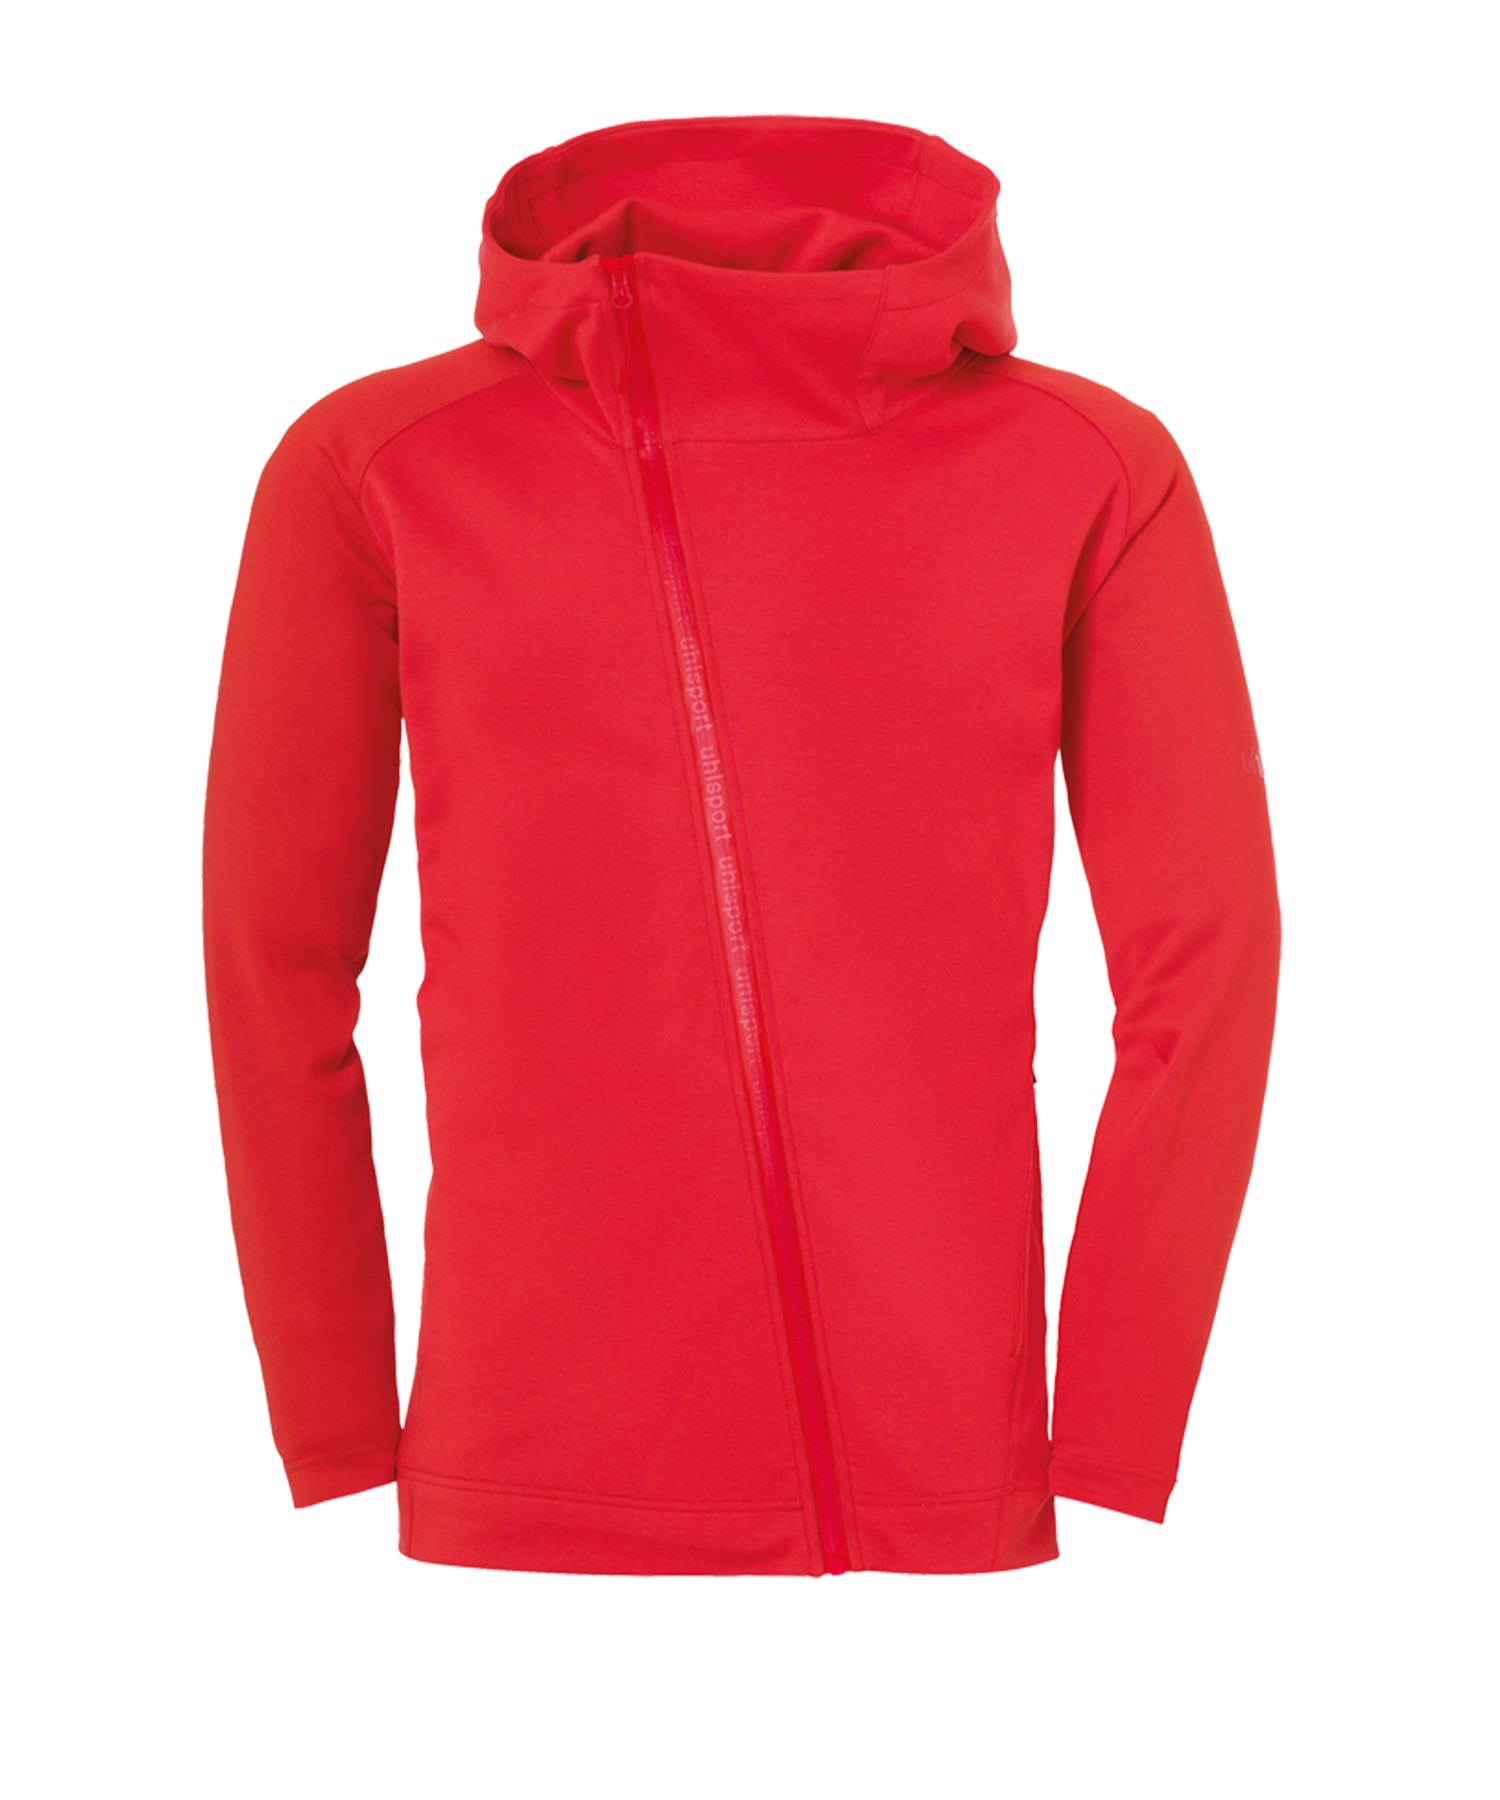 Uhlsport Essential Pro Kapuzenjacke Rot F04 - Rot